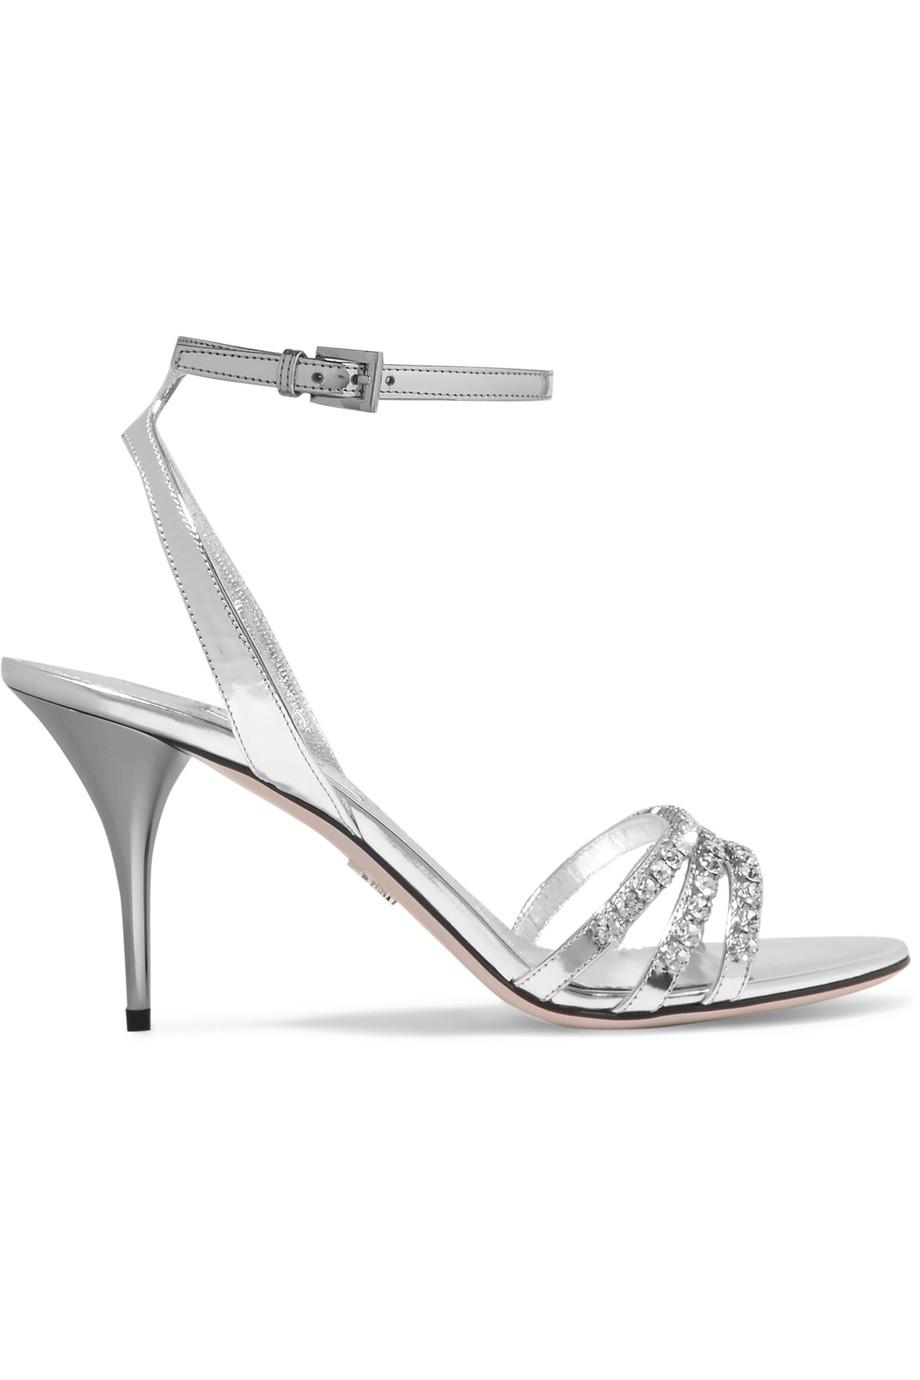 più recente 2019 originale design elegante Scarpe da cerimonia argento, i modelli più eleganti | Pourfemme